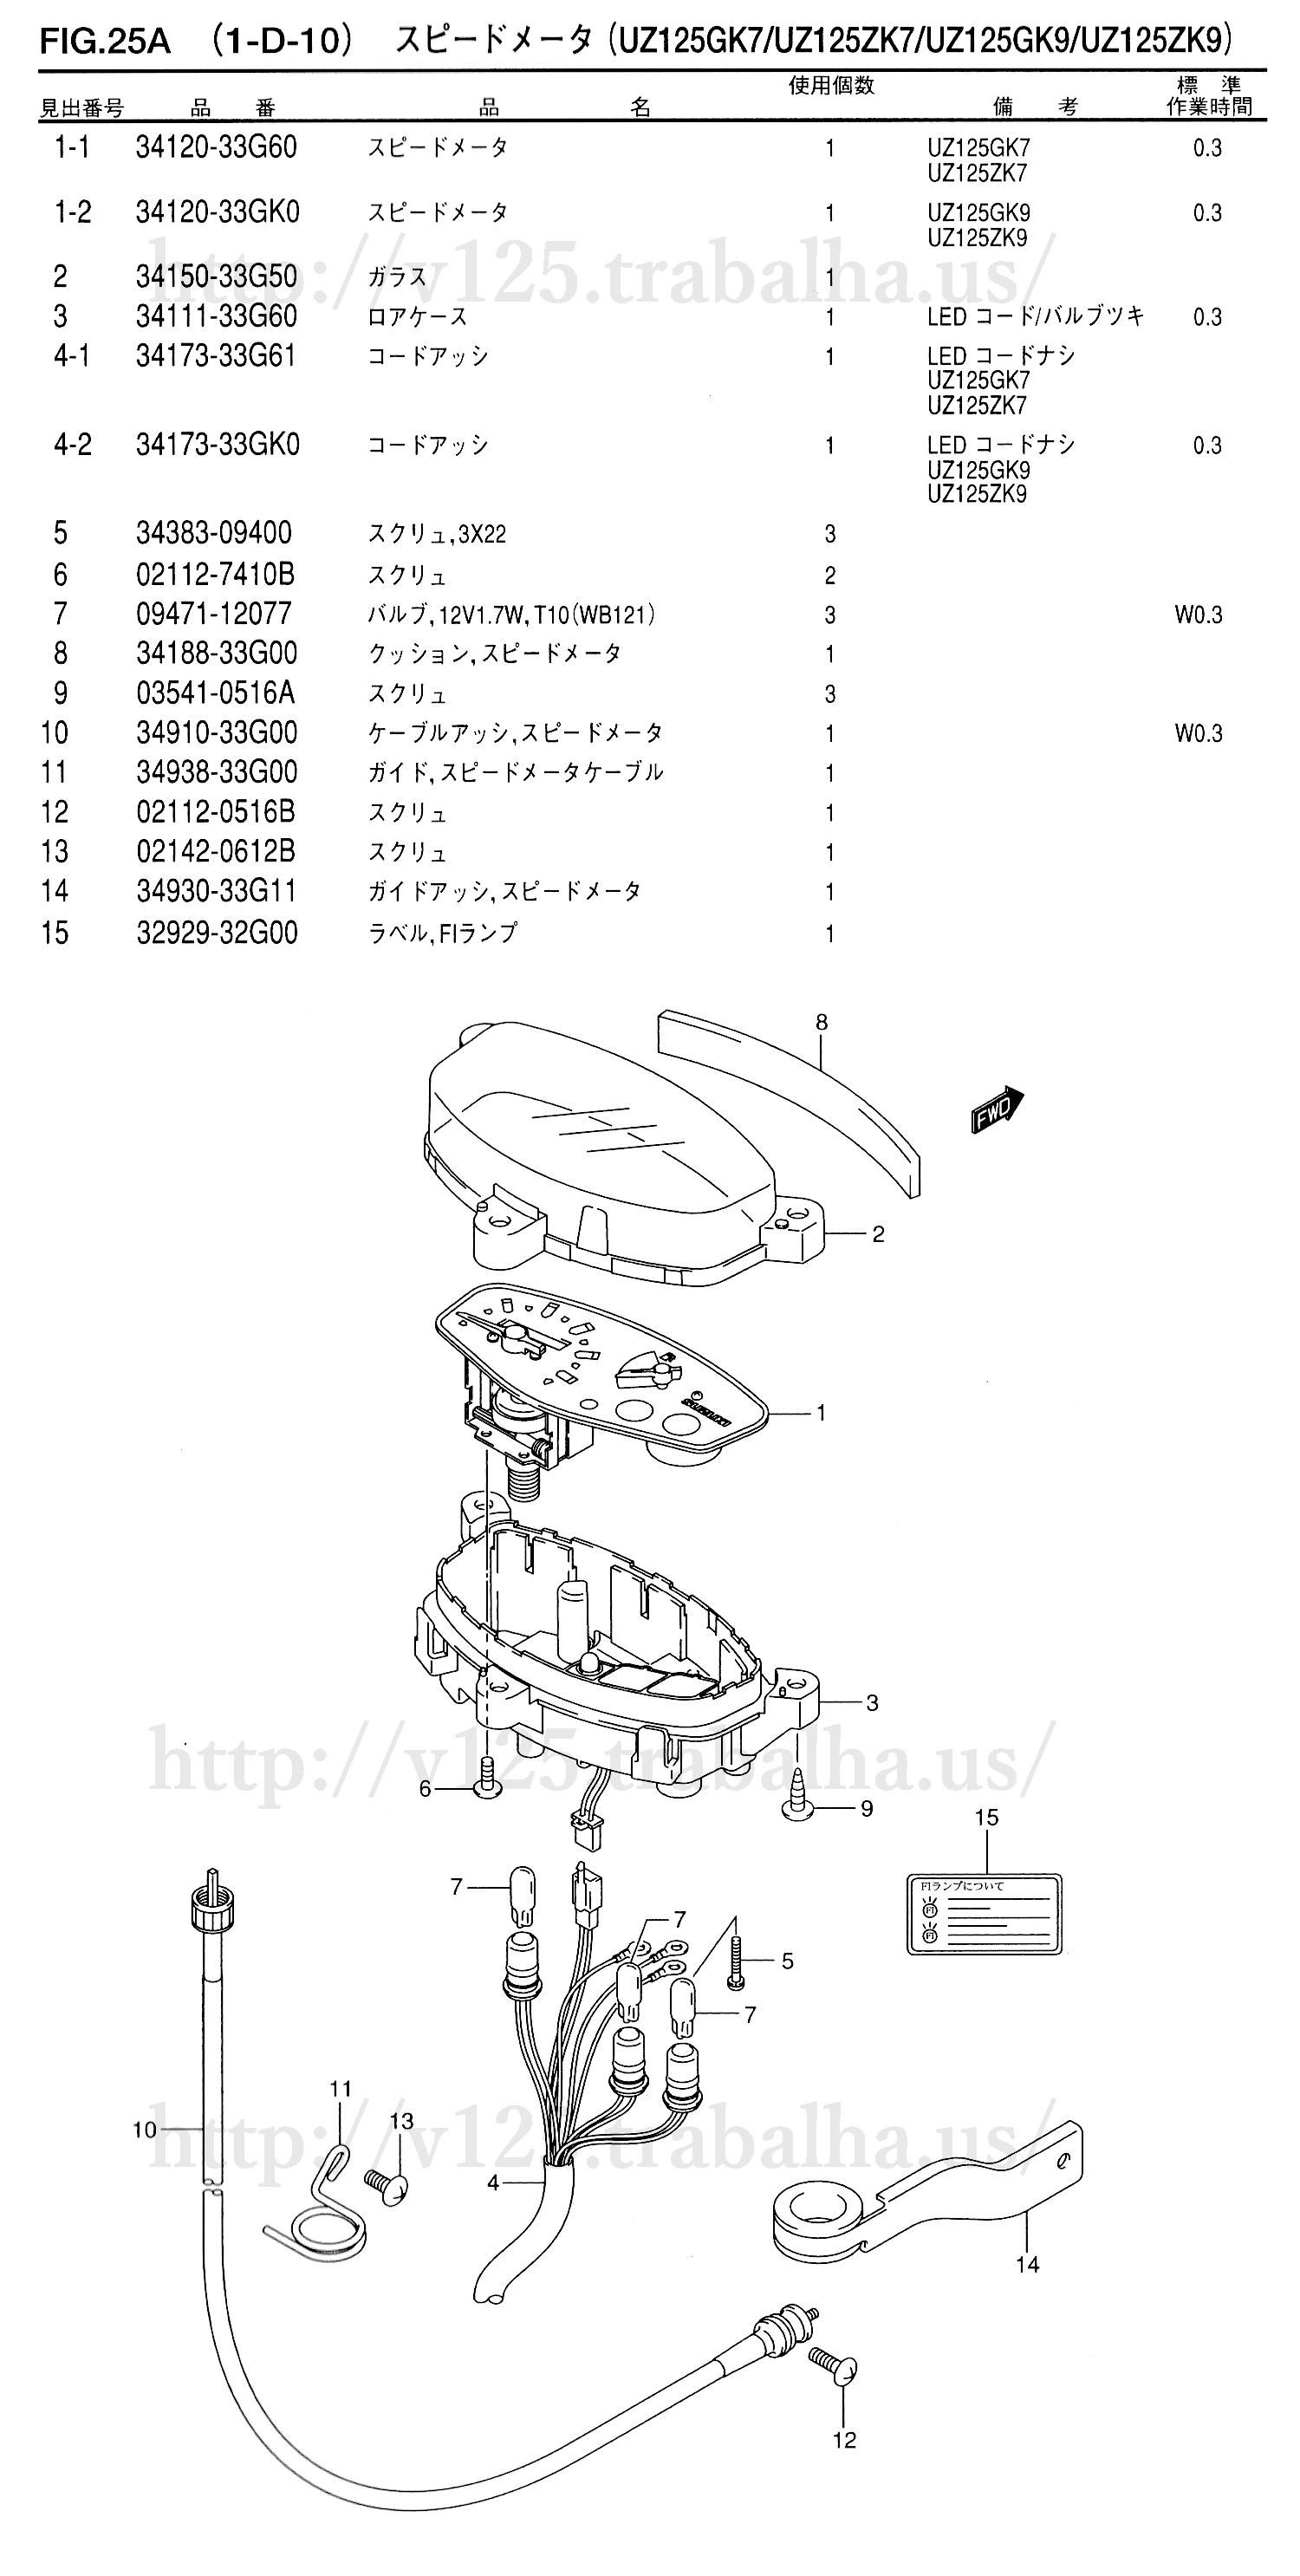 FIG.25A(1-D-10)スピードメータ(UZ125GK7/UZ125ZK7/UZ125GK9/UZ125ZK9)